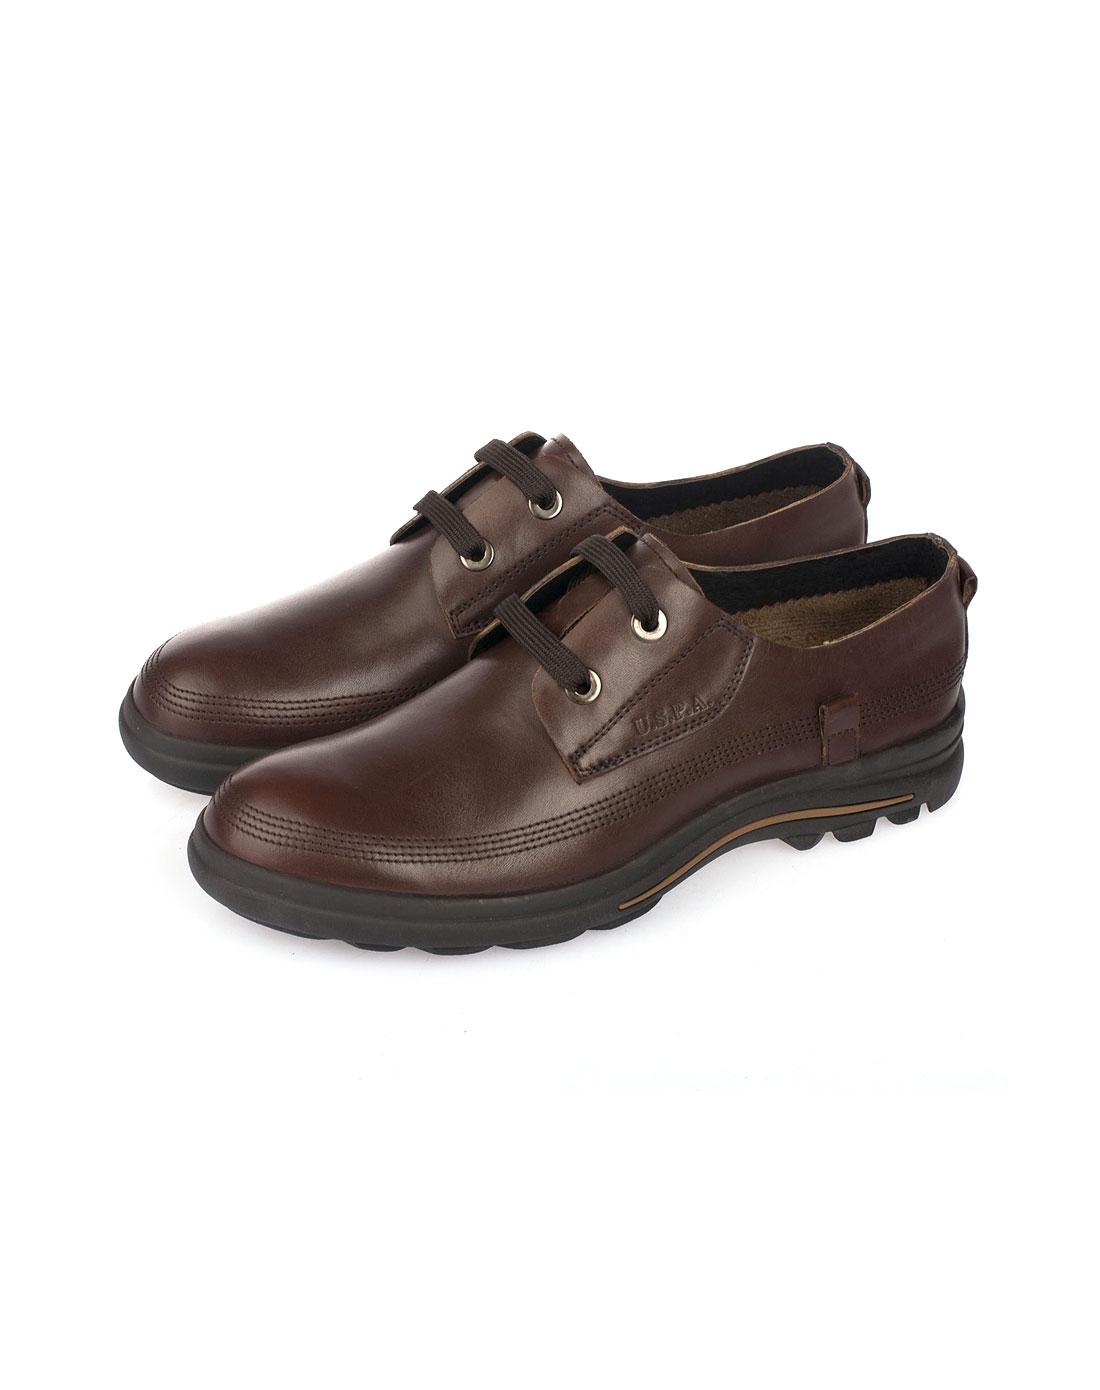 assn.男款棕休闲皮鞋